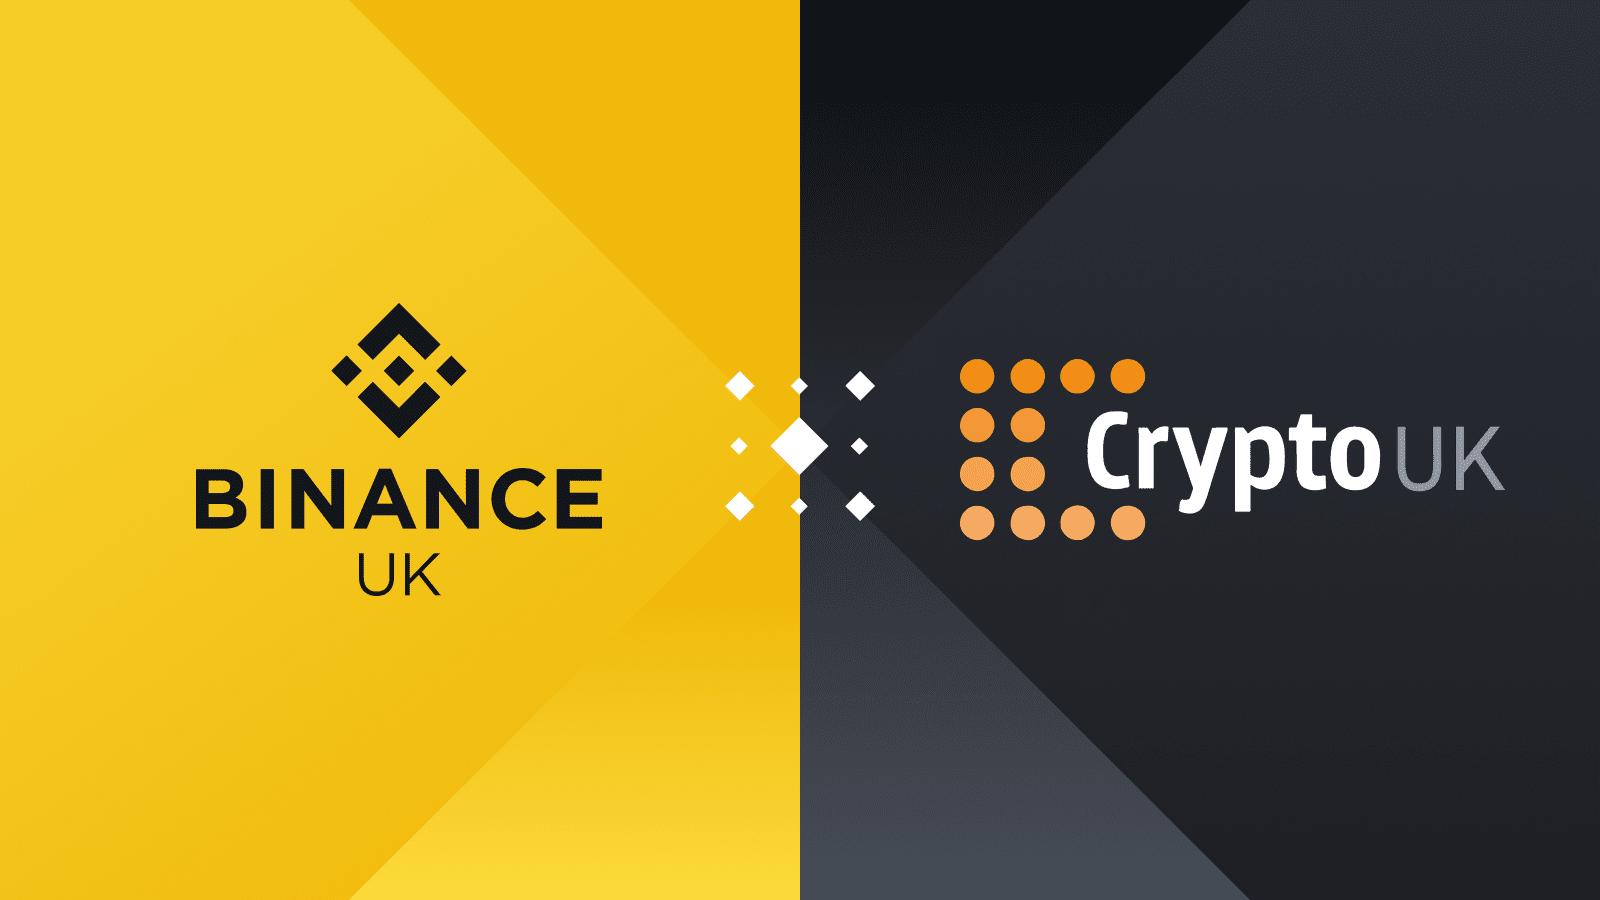 Binance.UK Joins Trade Association CryptoUK   Binance Blog